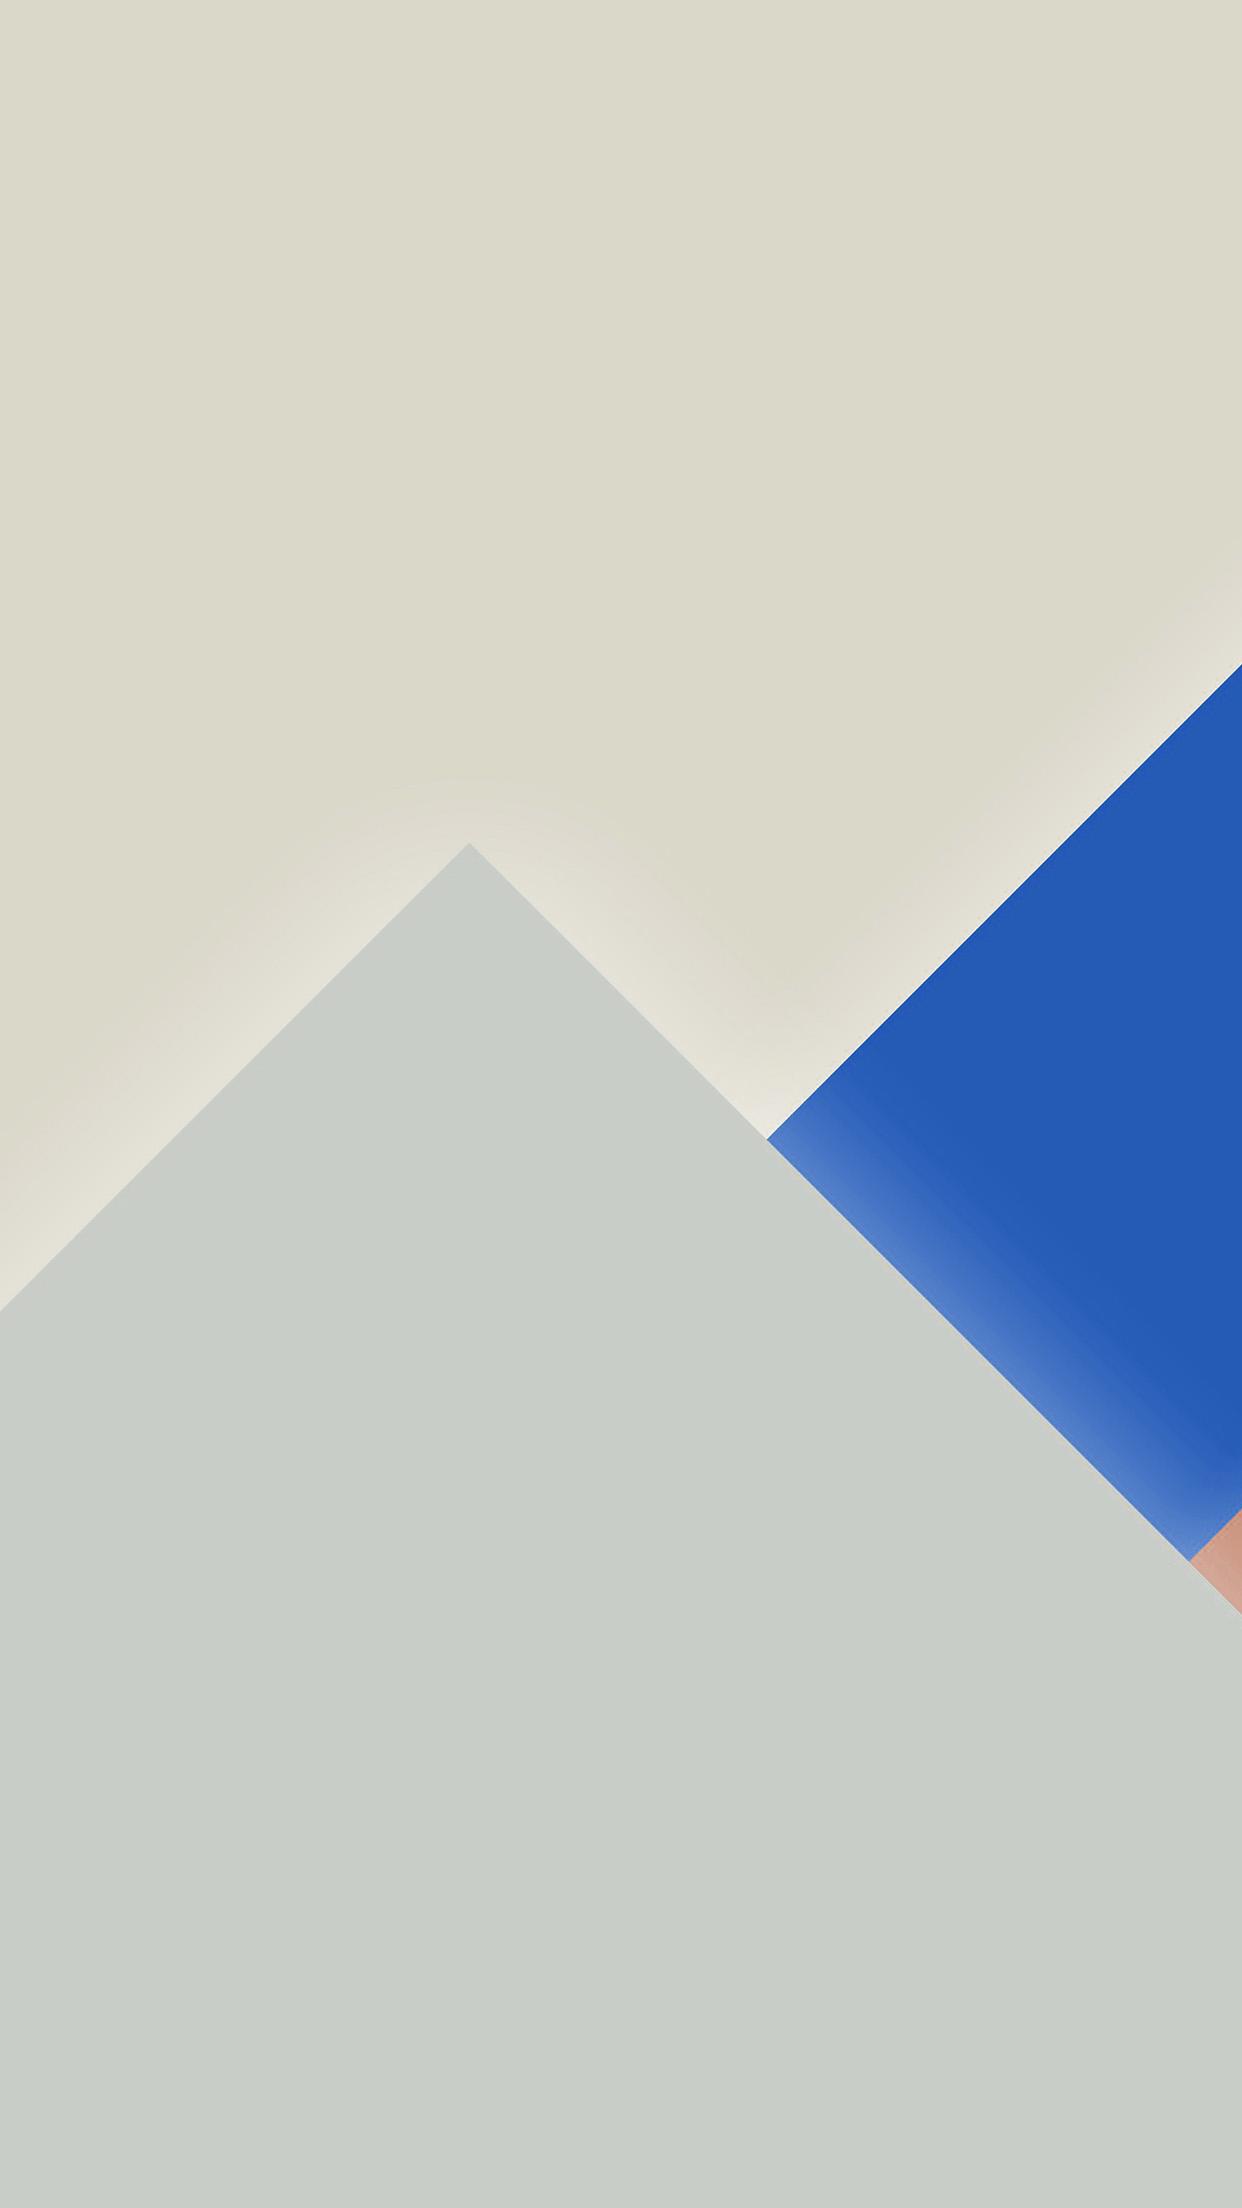 material design wallpaper blue - photo #8